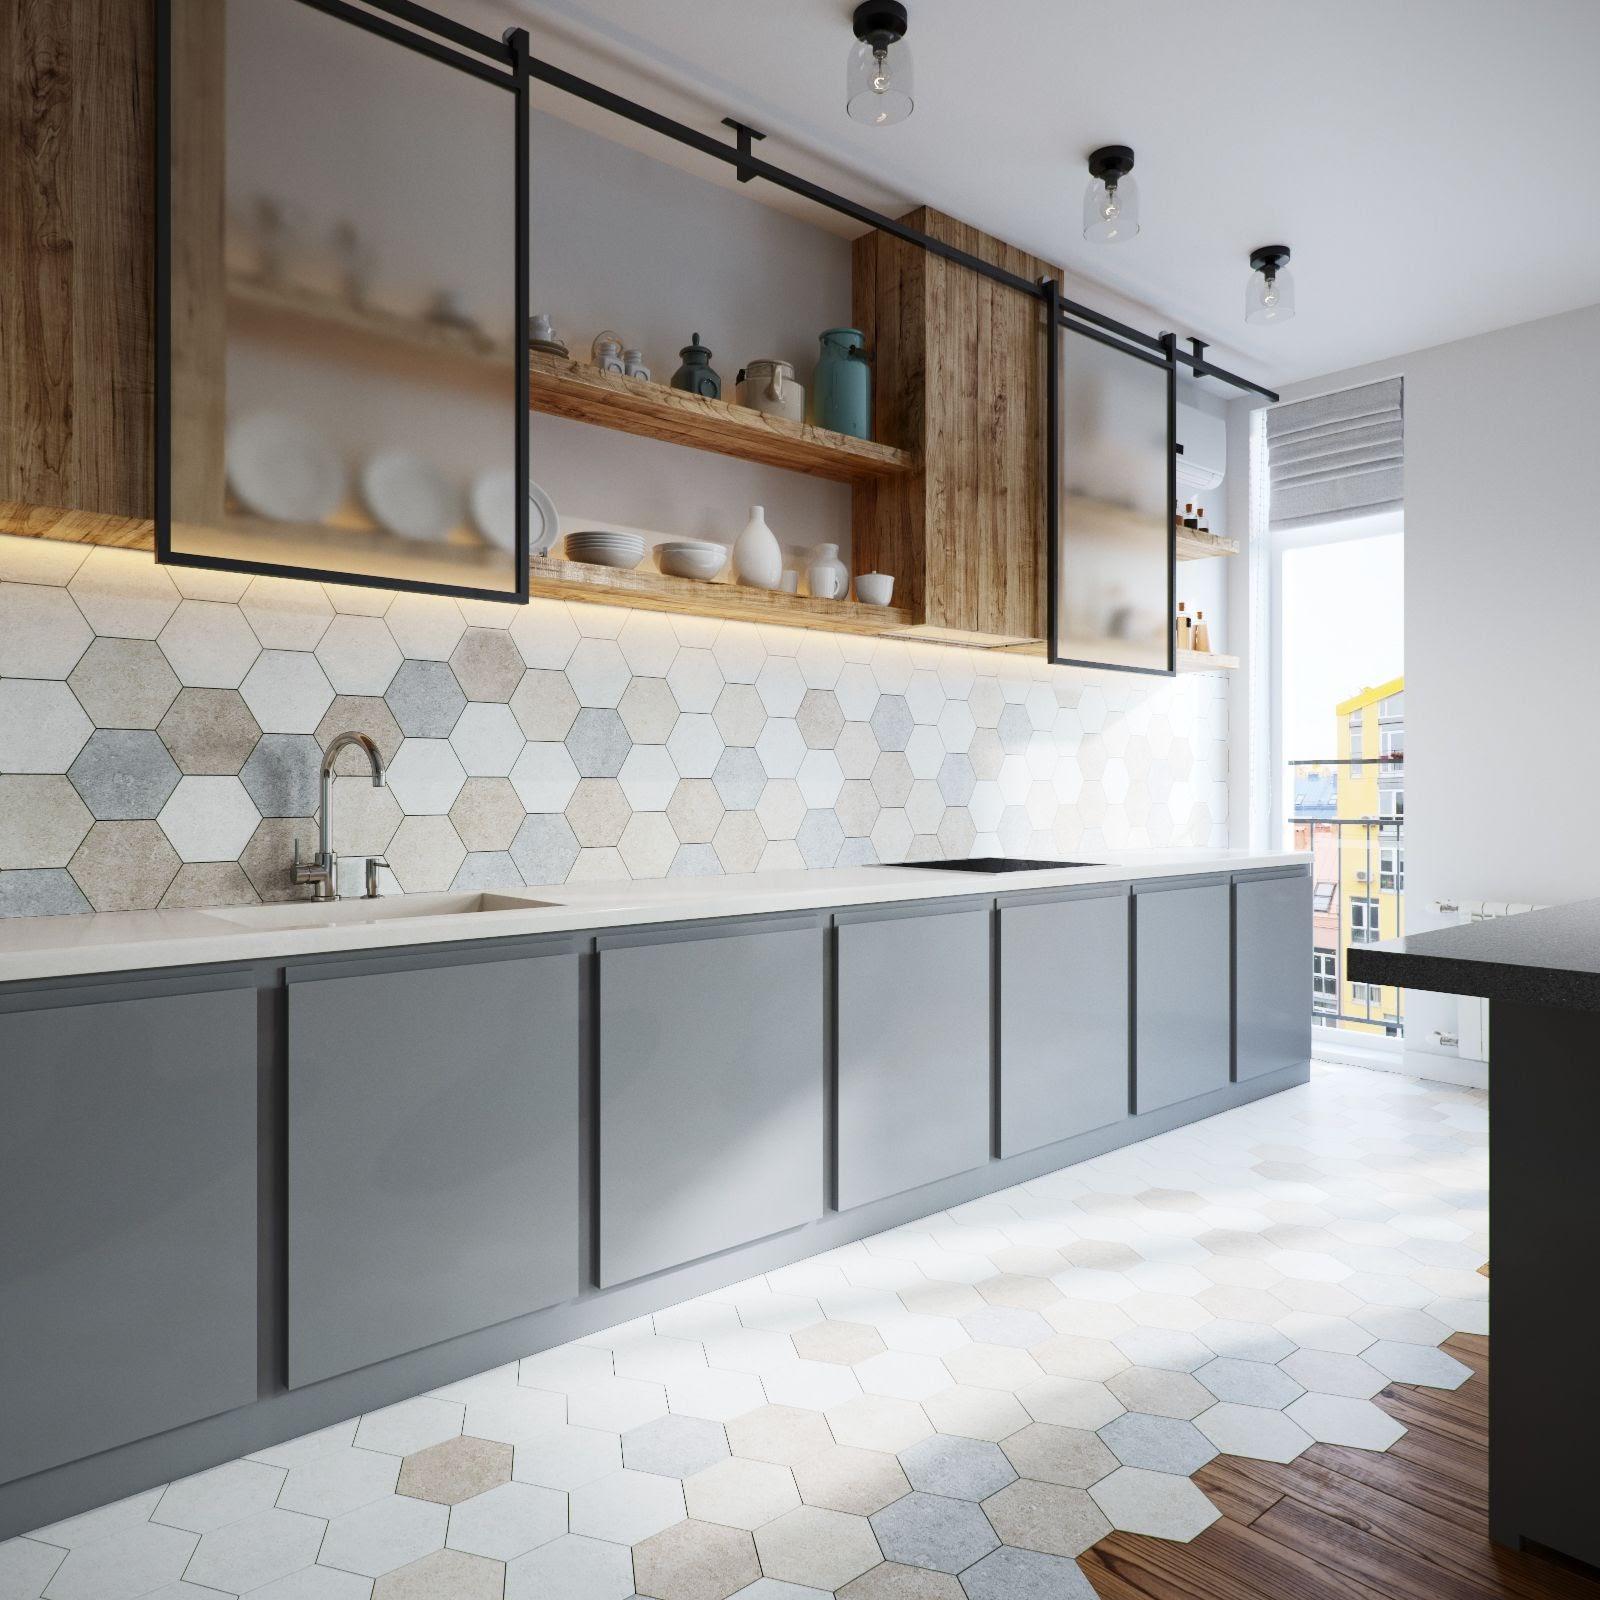 cozinha sala integrada piso revestimento hexagonal colorido